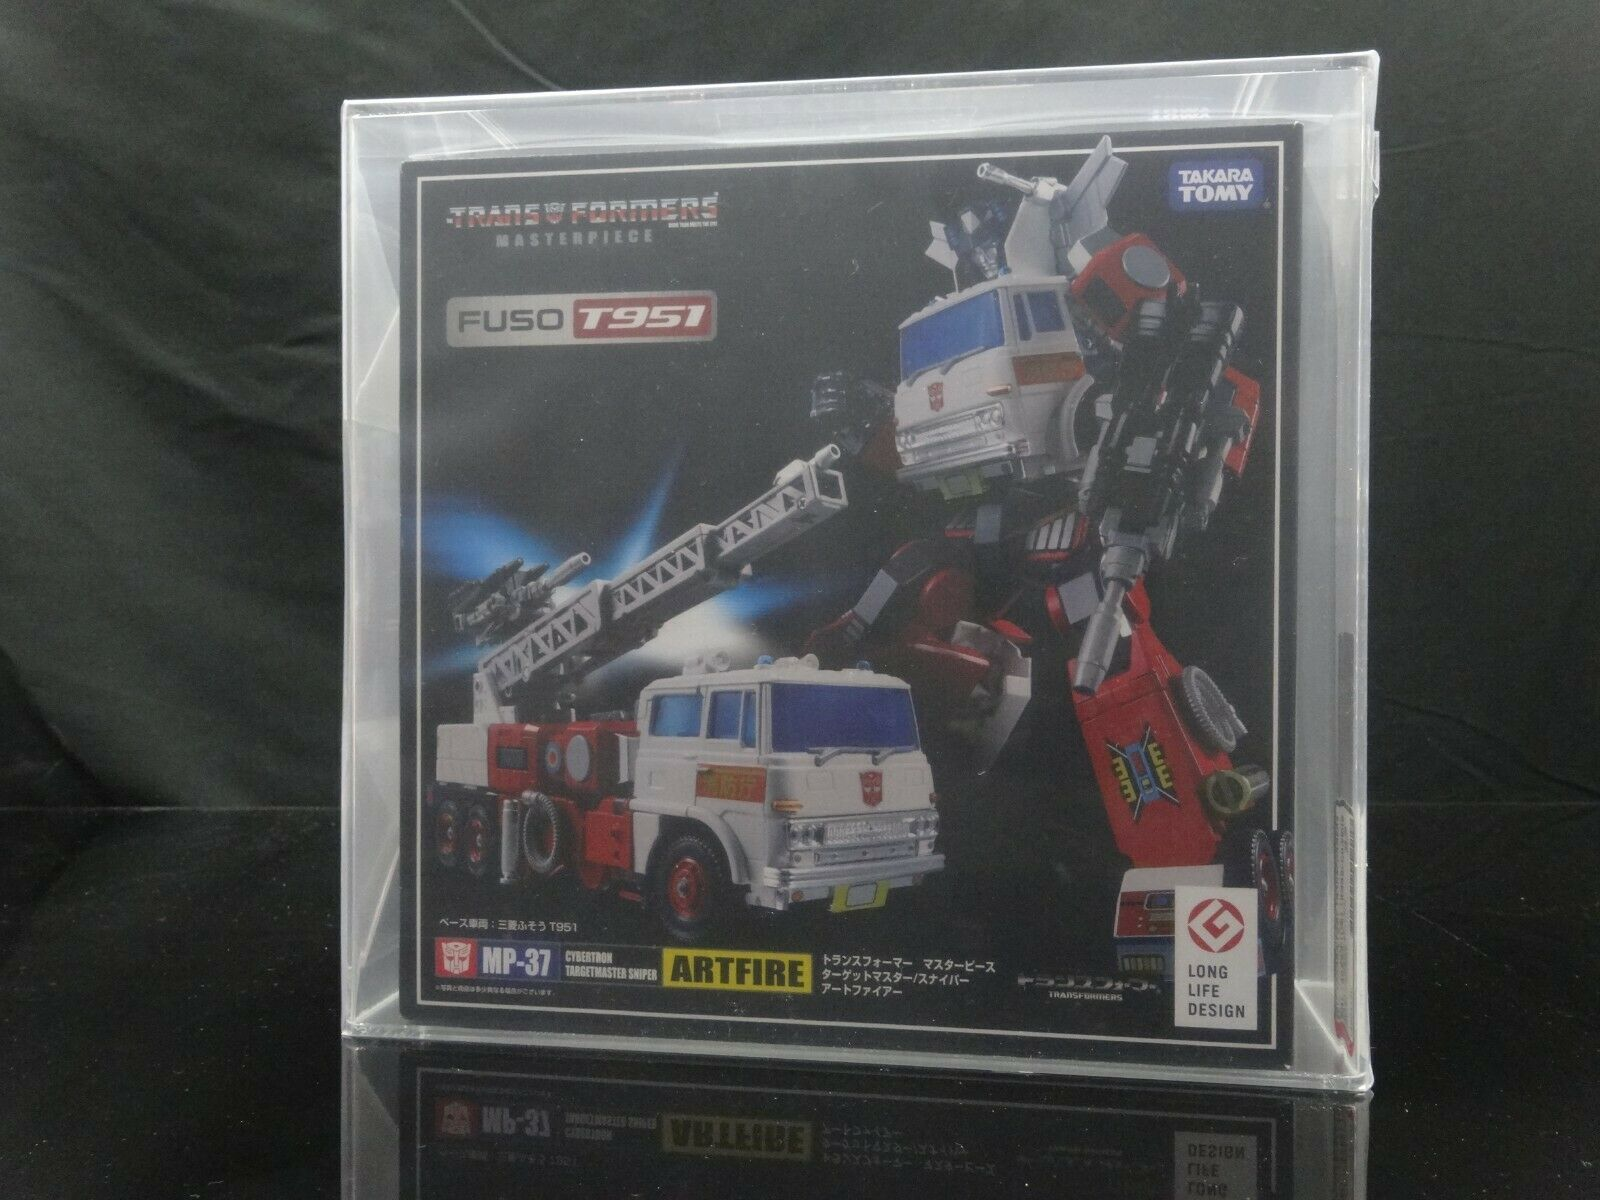 Transformers MP-37 Artfire  - Takara Masterpiece